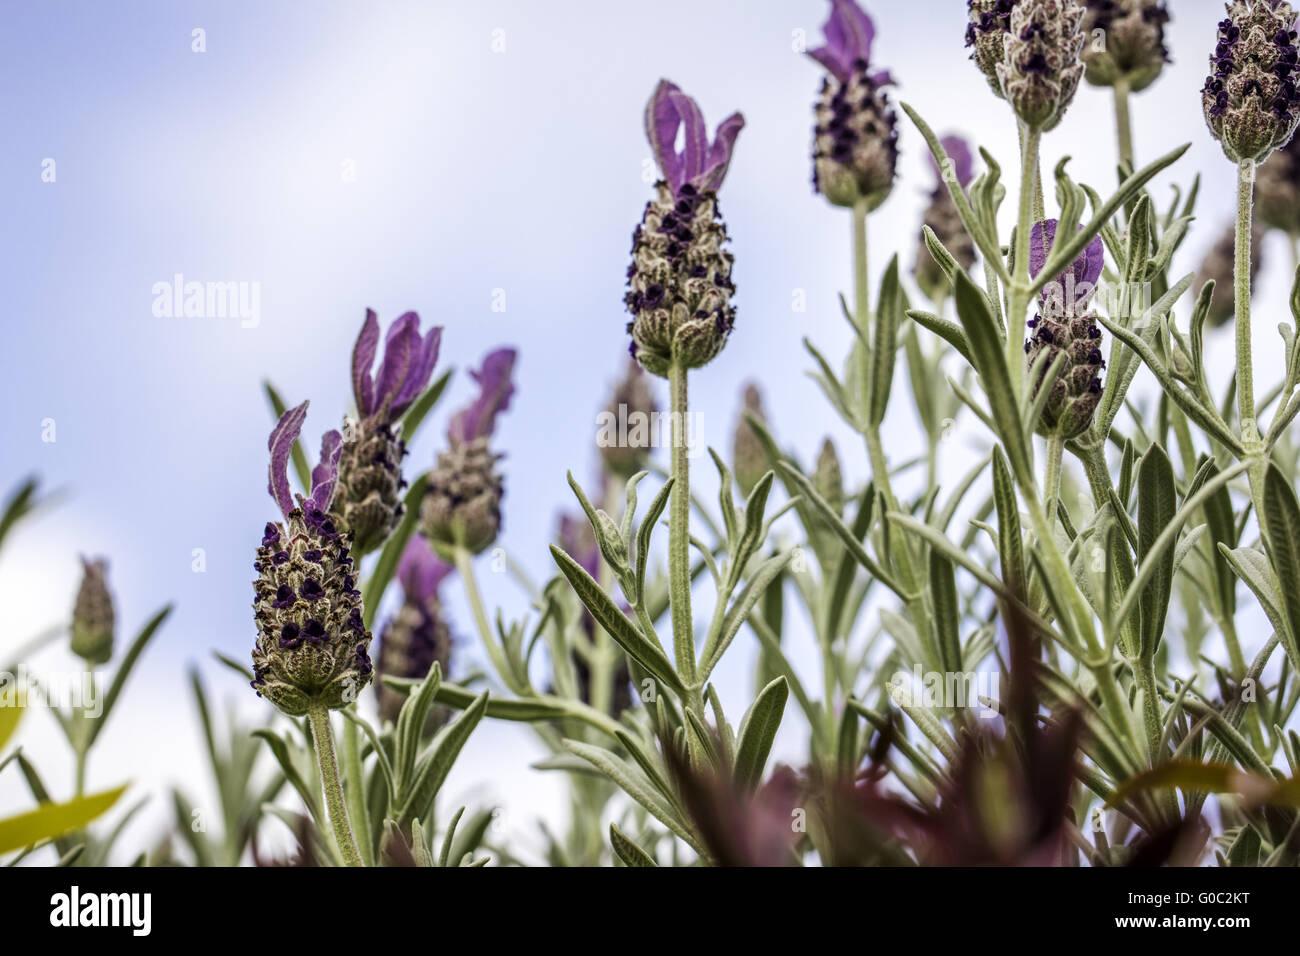 Lavender Flowers Against Blue Sky Background - Stock Image